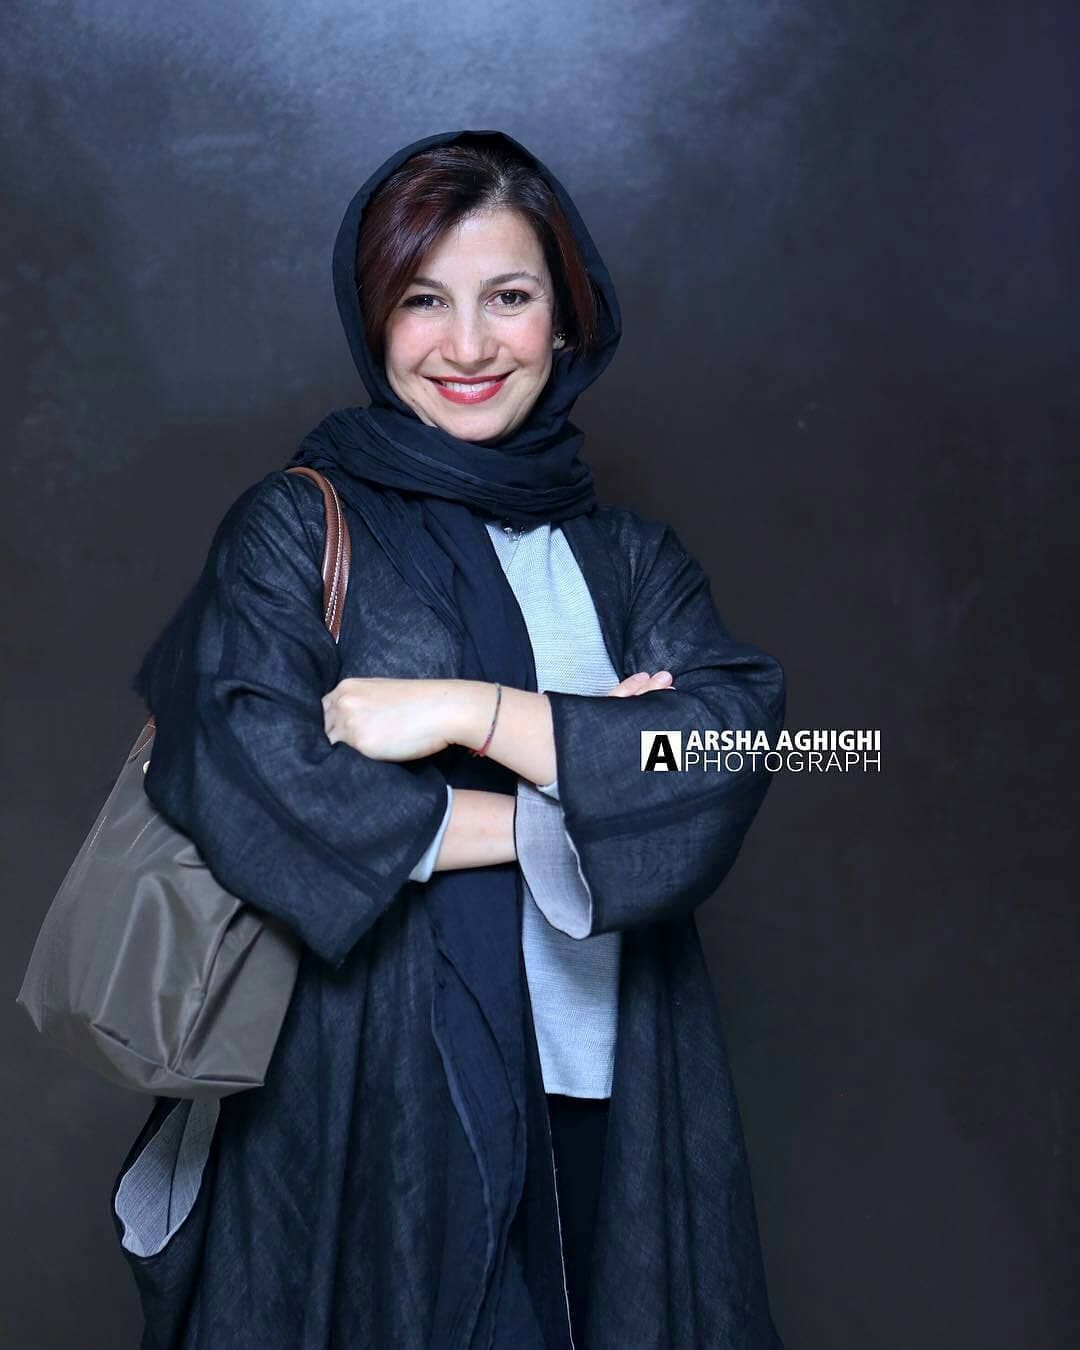 لیلی رشیدی | Persian girls, Women, Fashion